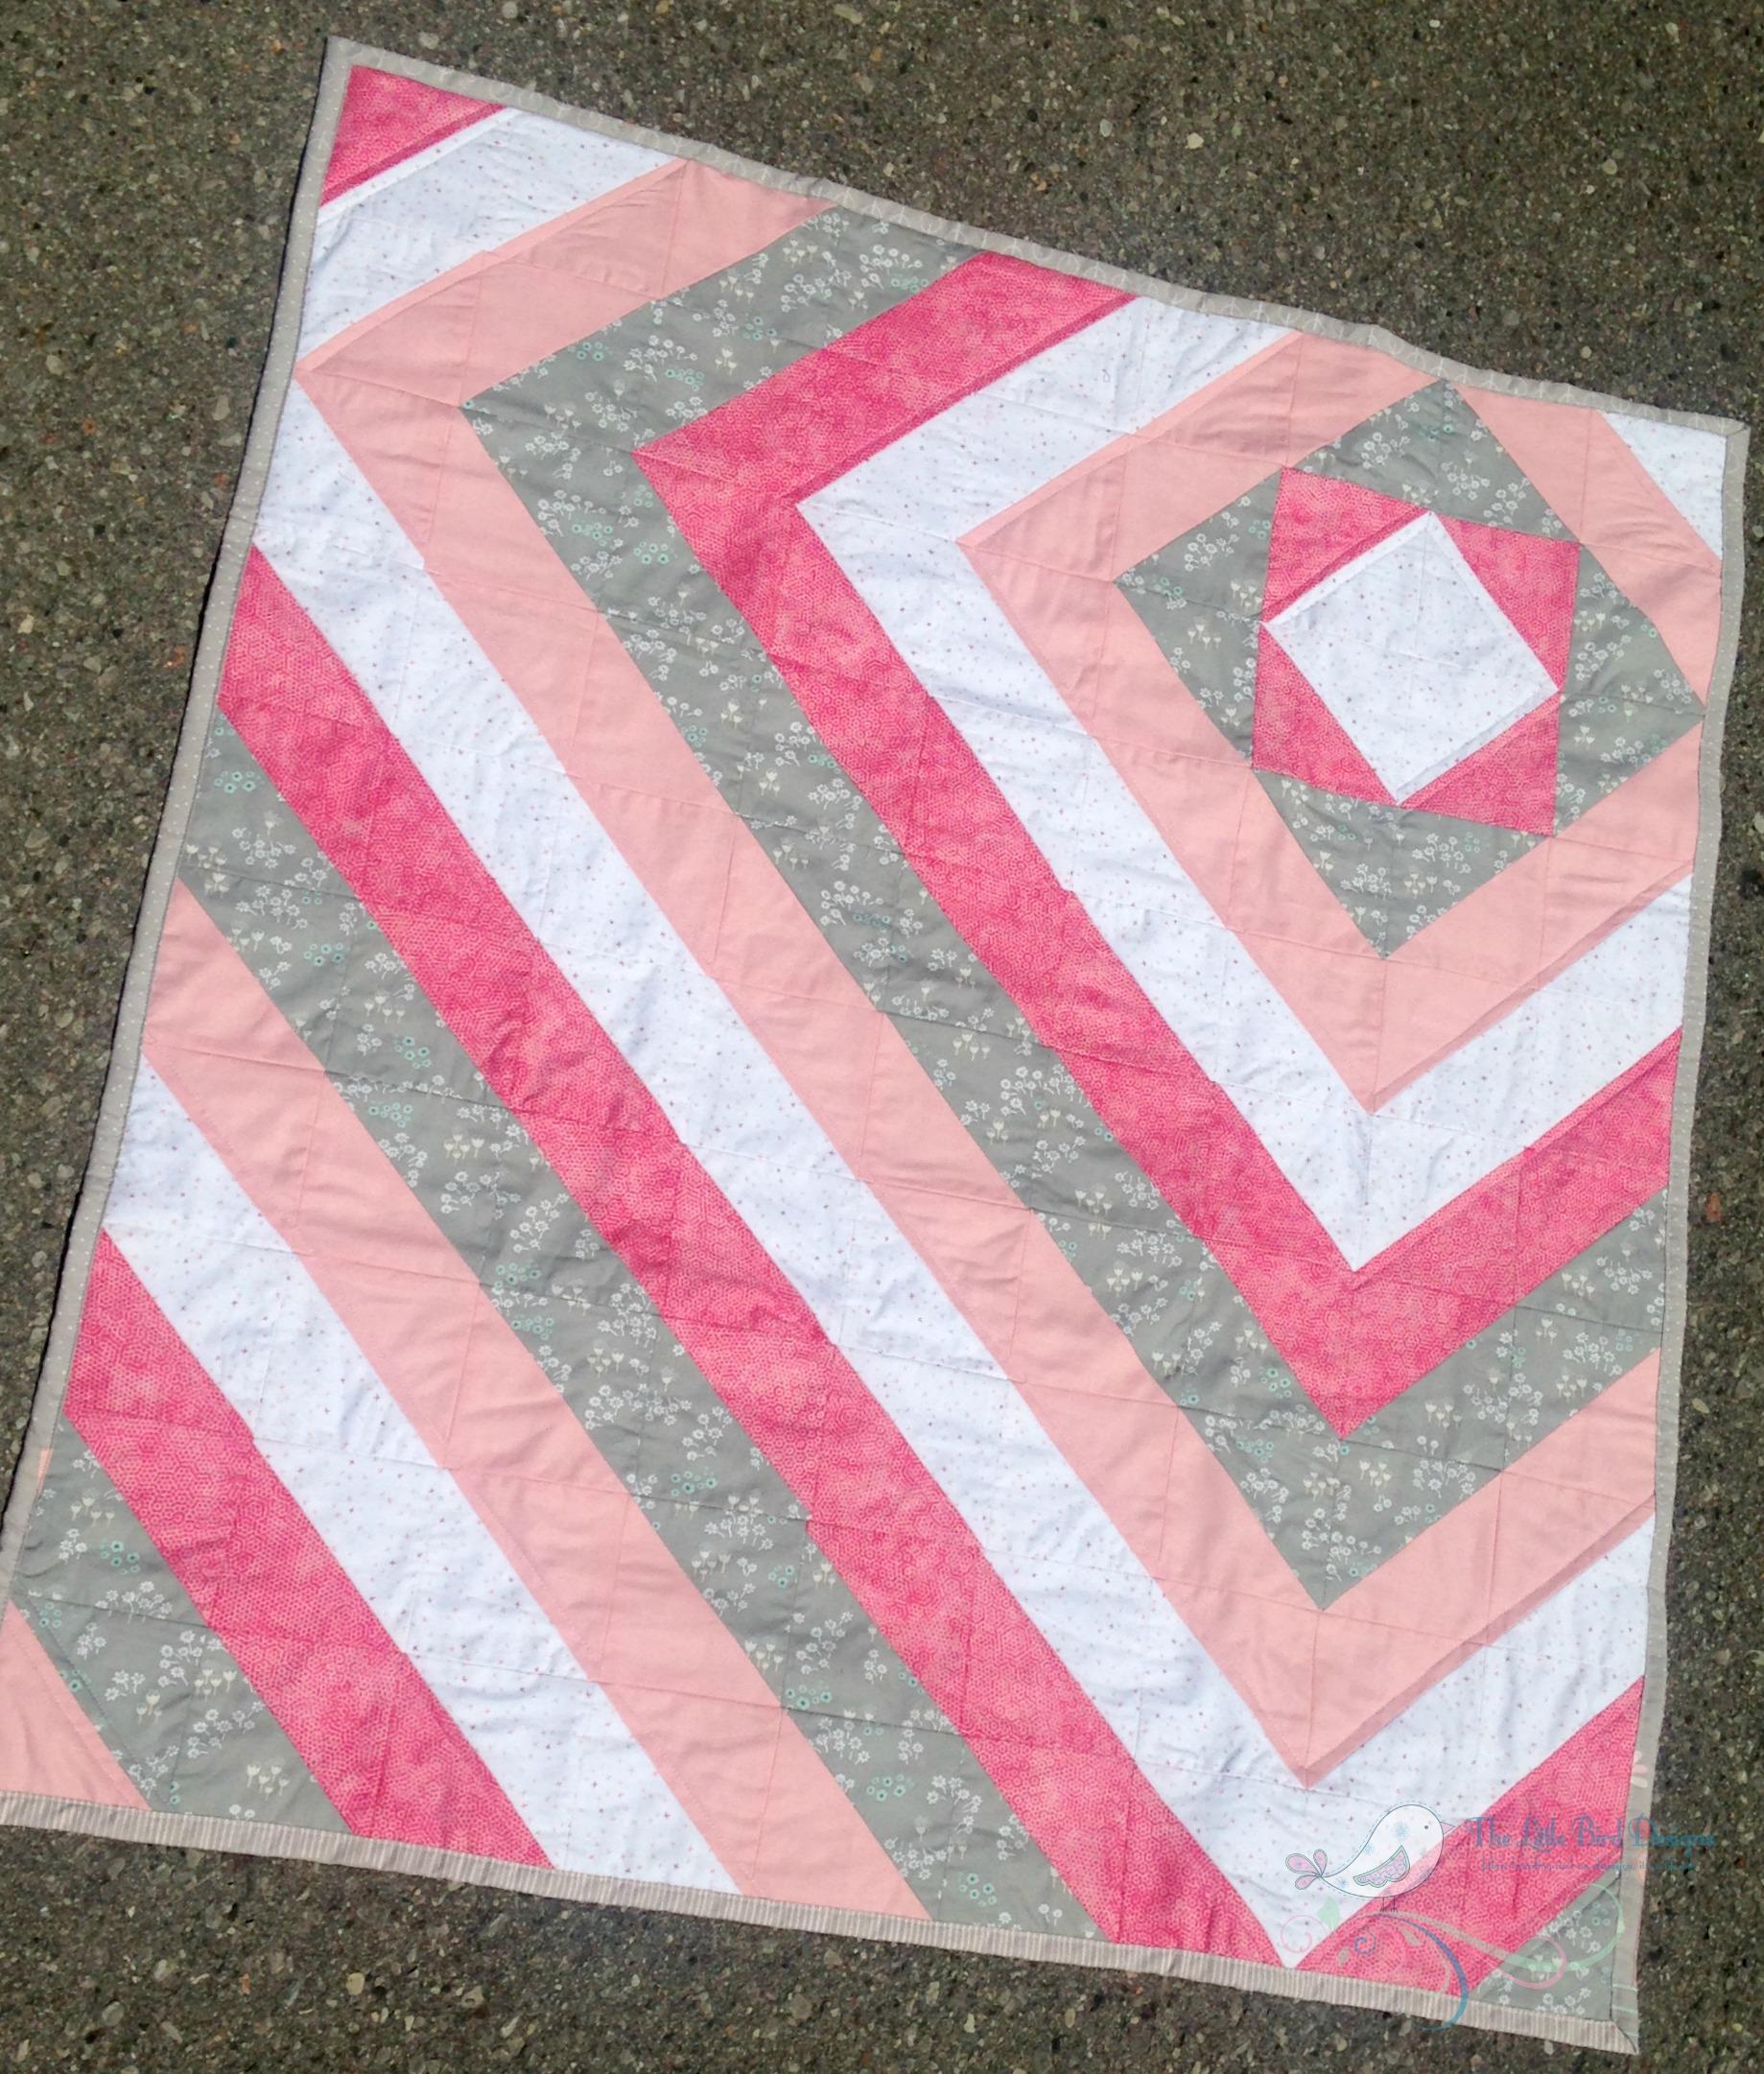 Handmade HST baby quilt front